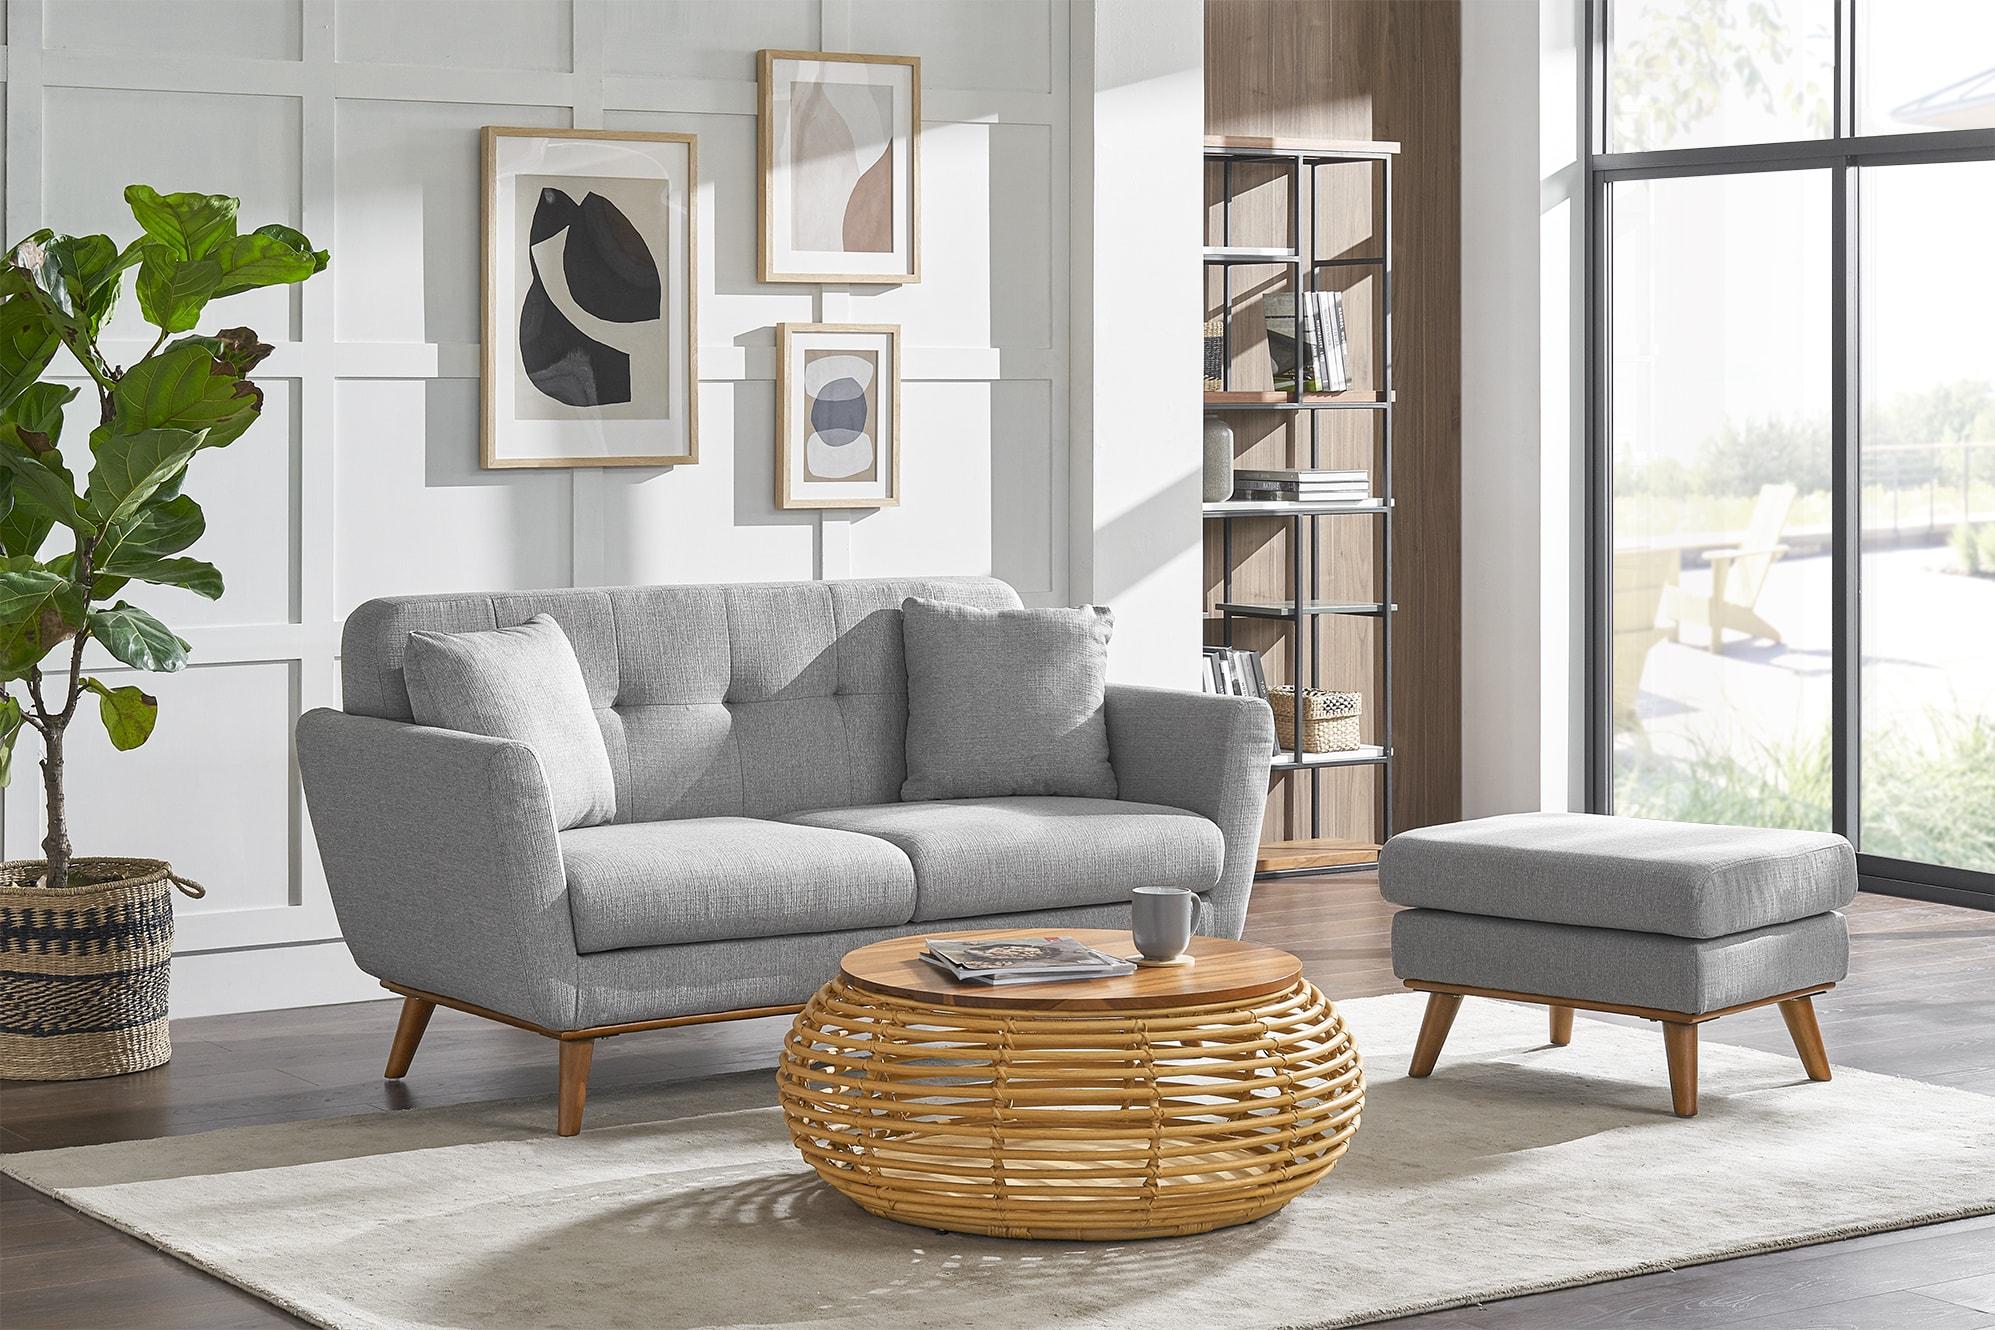 Castlery Hanford sofa